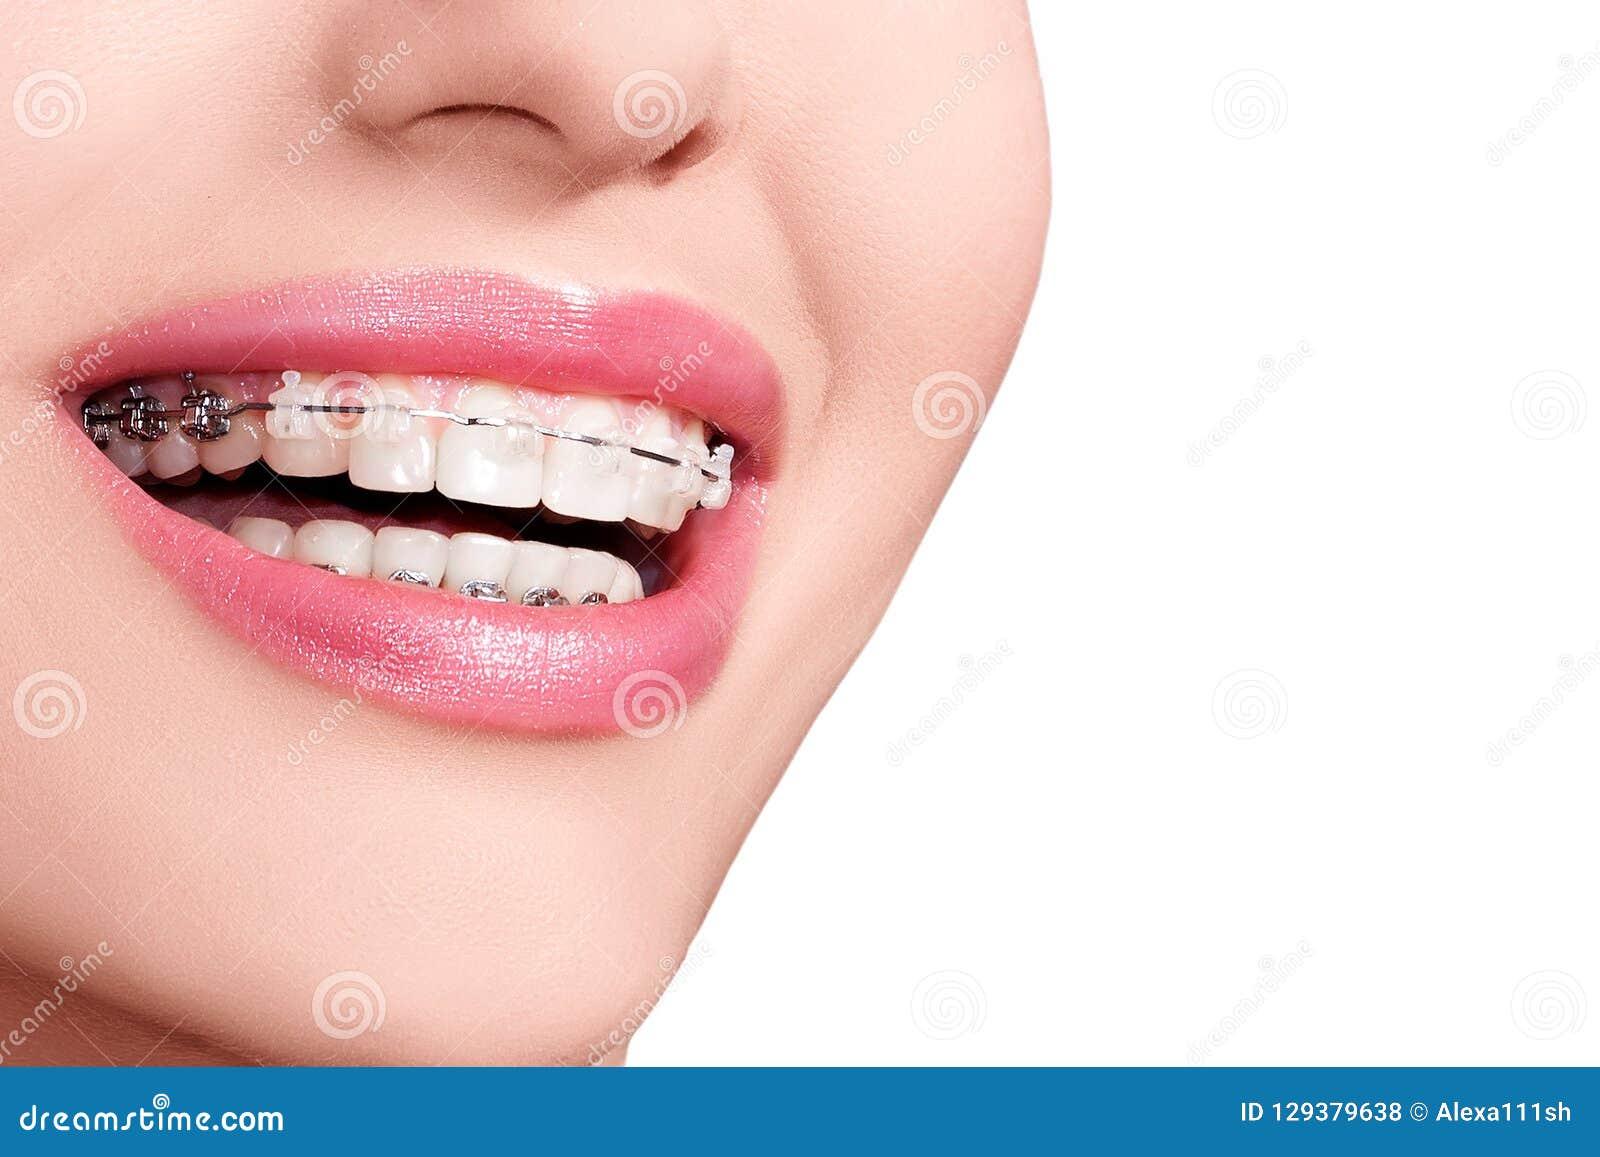 Braces teeth Οδοντικό χαμόγελο στηριγμάτων orthodontic επεξεργασία